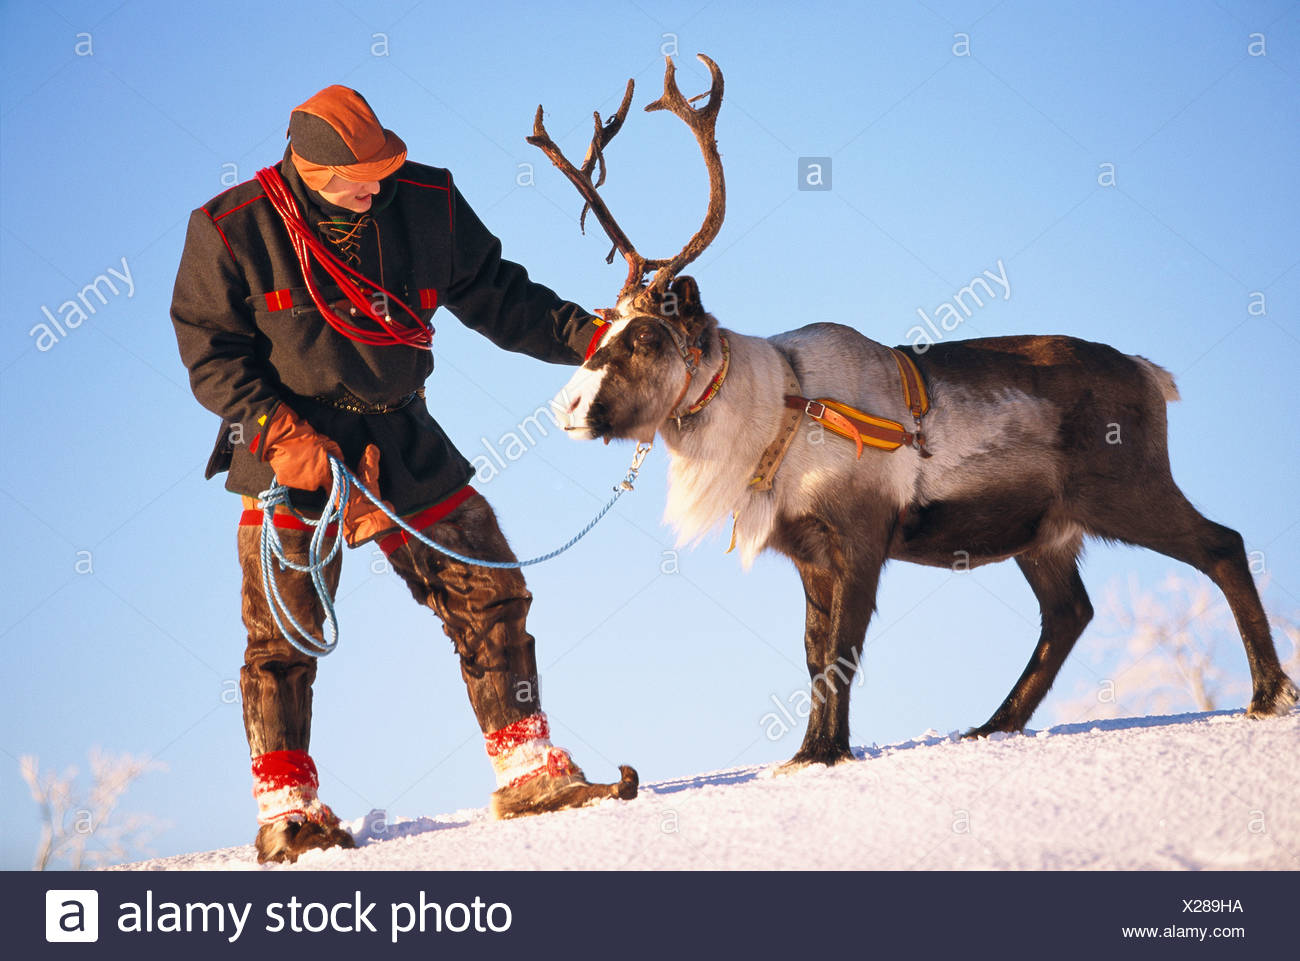 A Laplander and a reindeer, Lapland, Sweden. - Stock Image